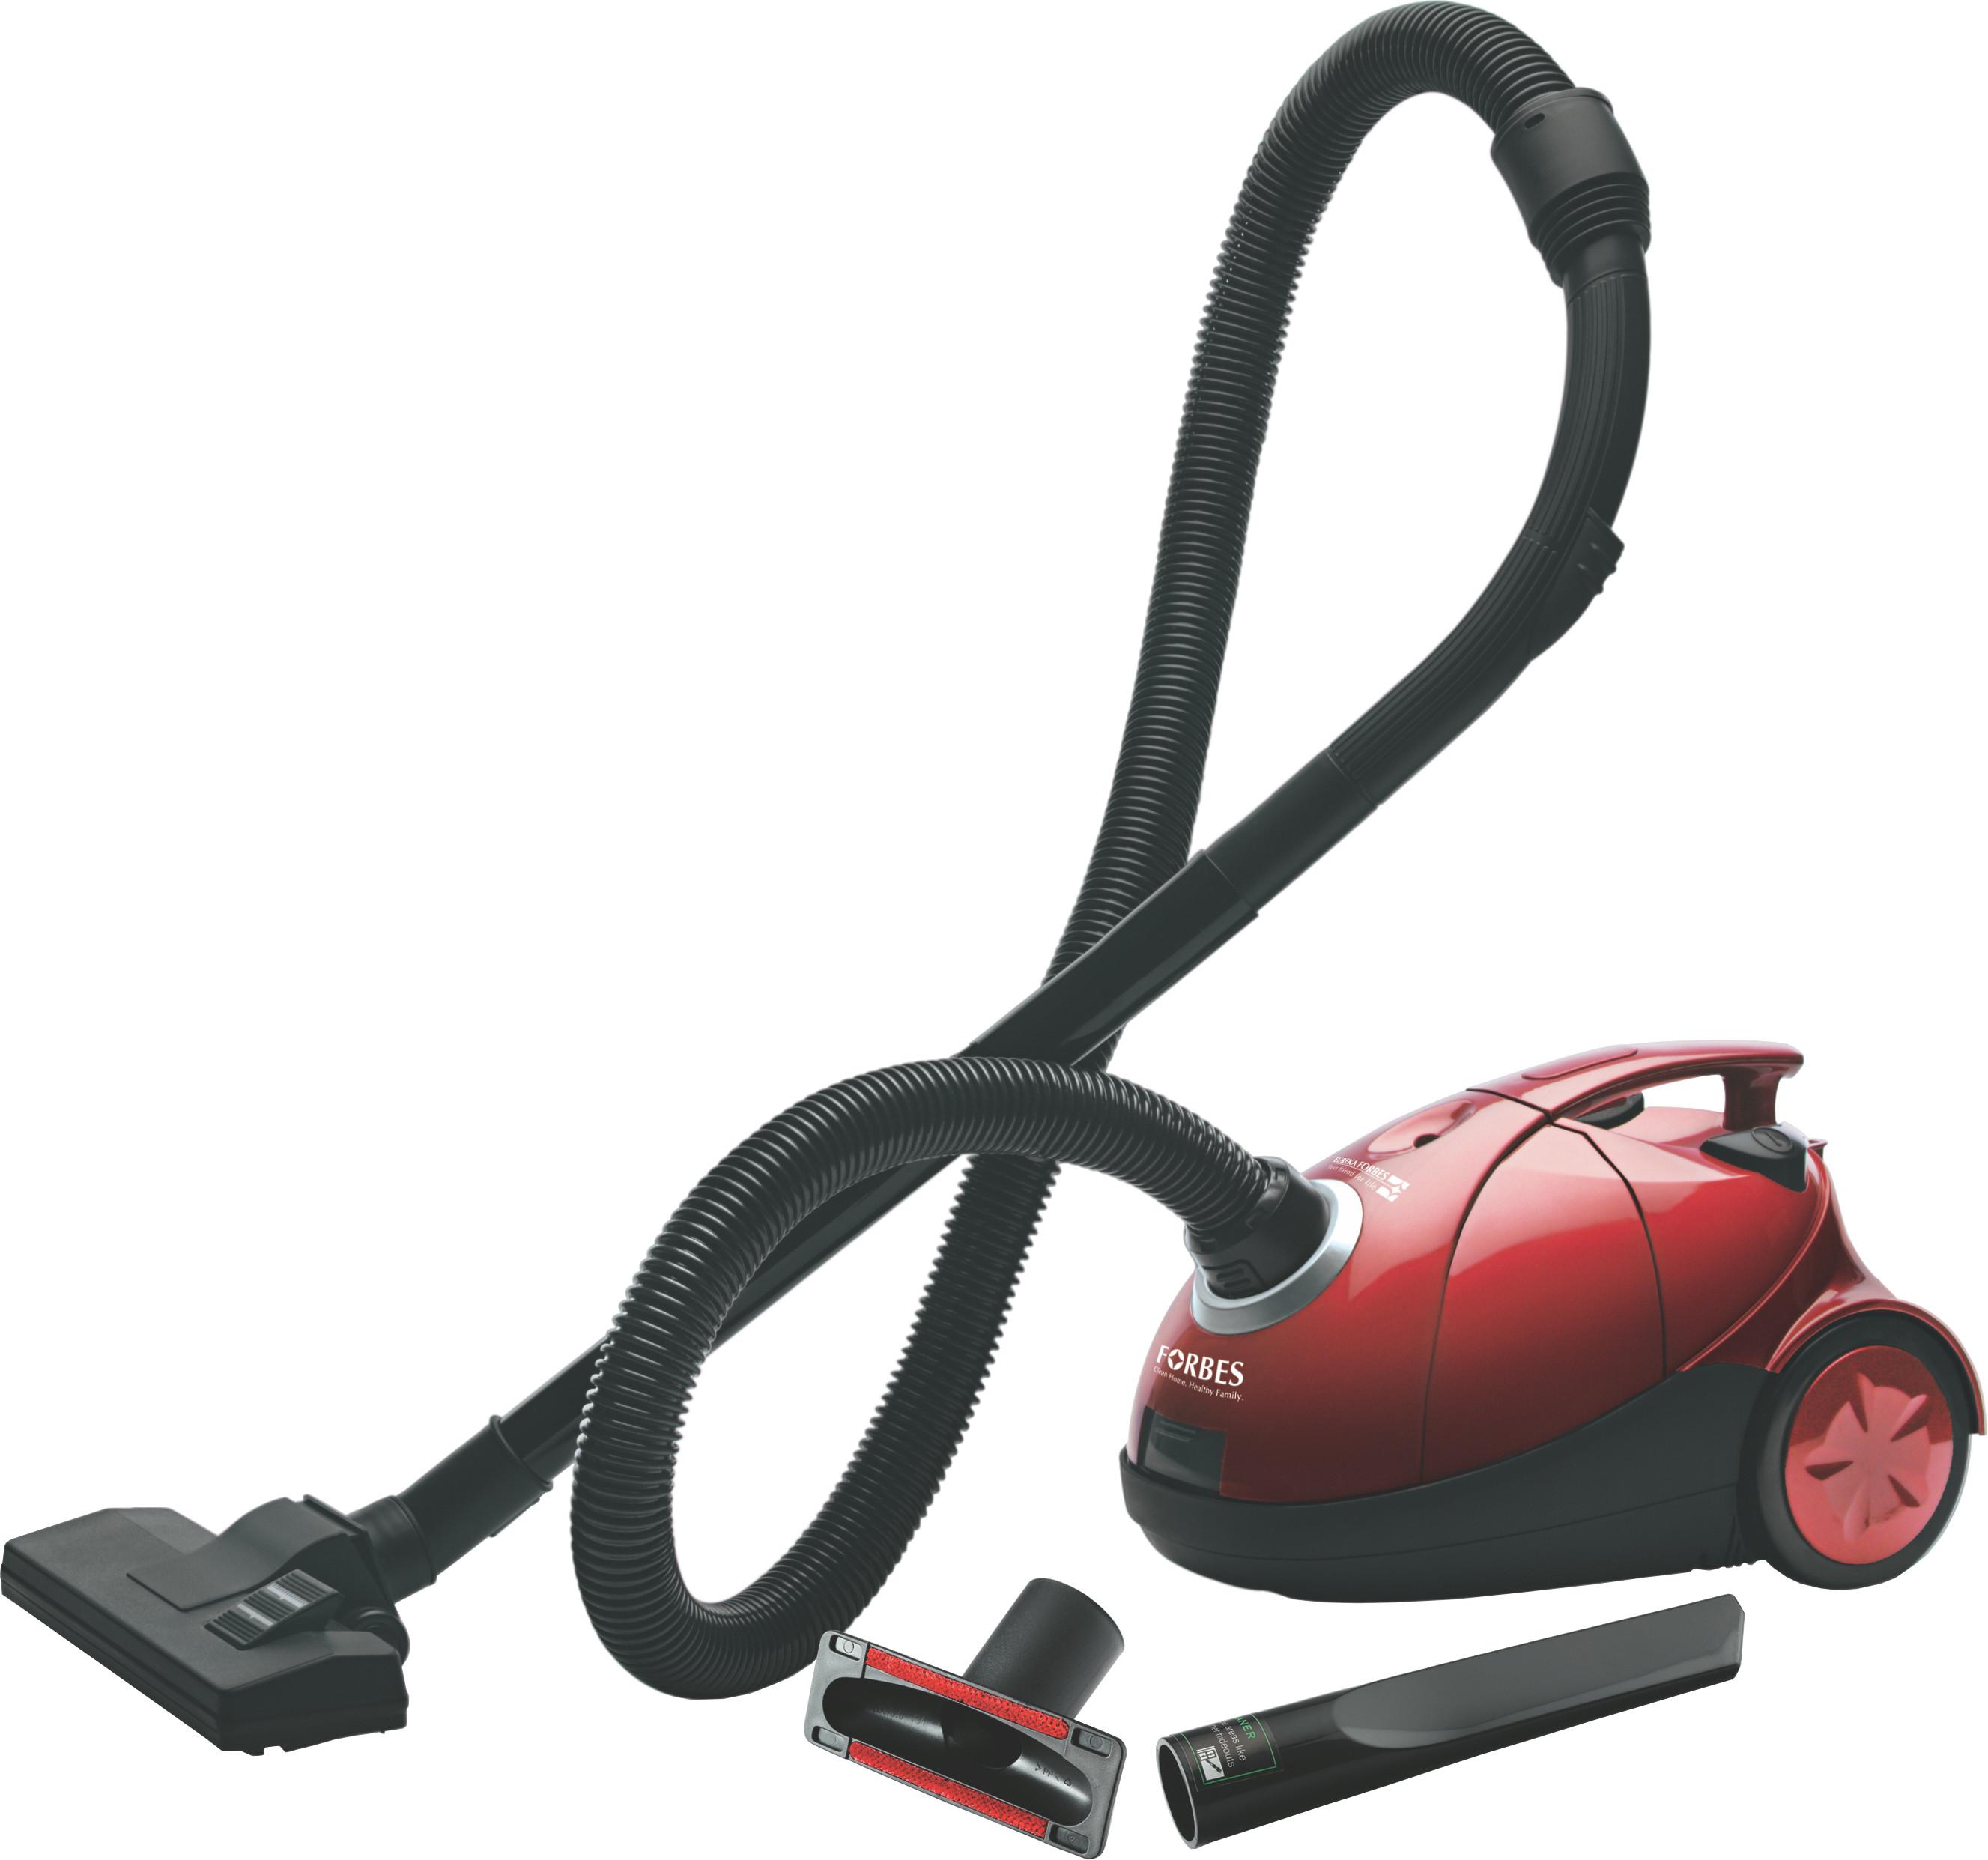 Deals - Thanjavur - Vacuum Cleeaners <br> Eureka Forbes<br> Category - home_kitchen<br> Business - Flipkart.com